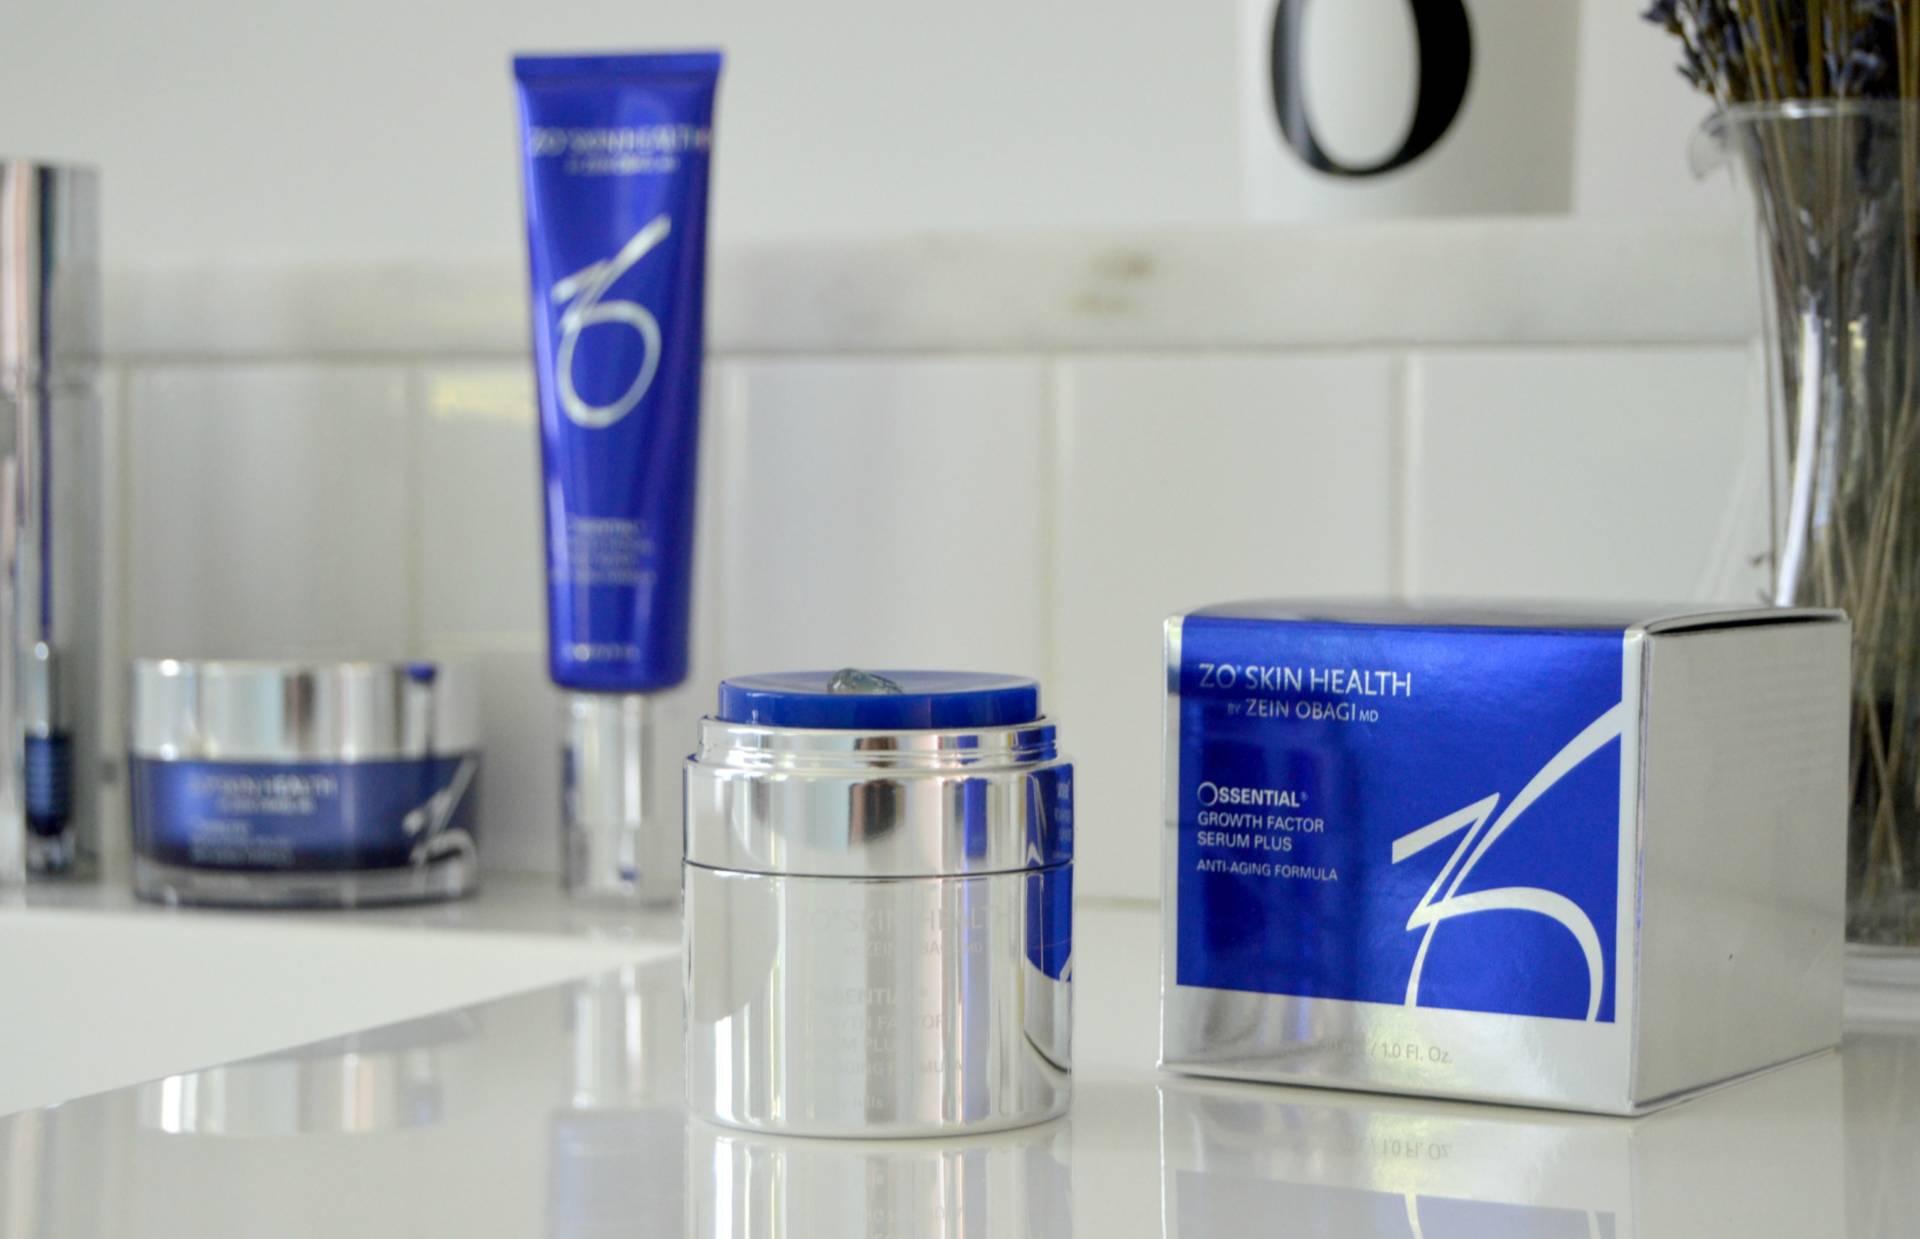 zo-skin-health-ossential-growth-factor-serum-inhautepursuit-review